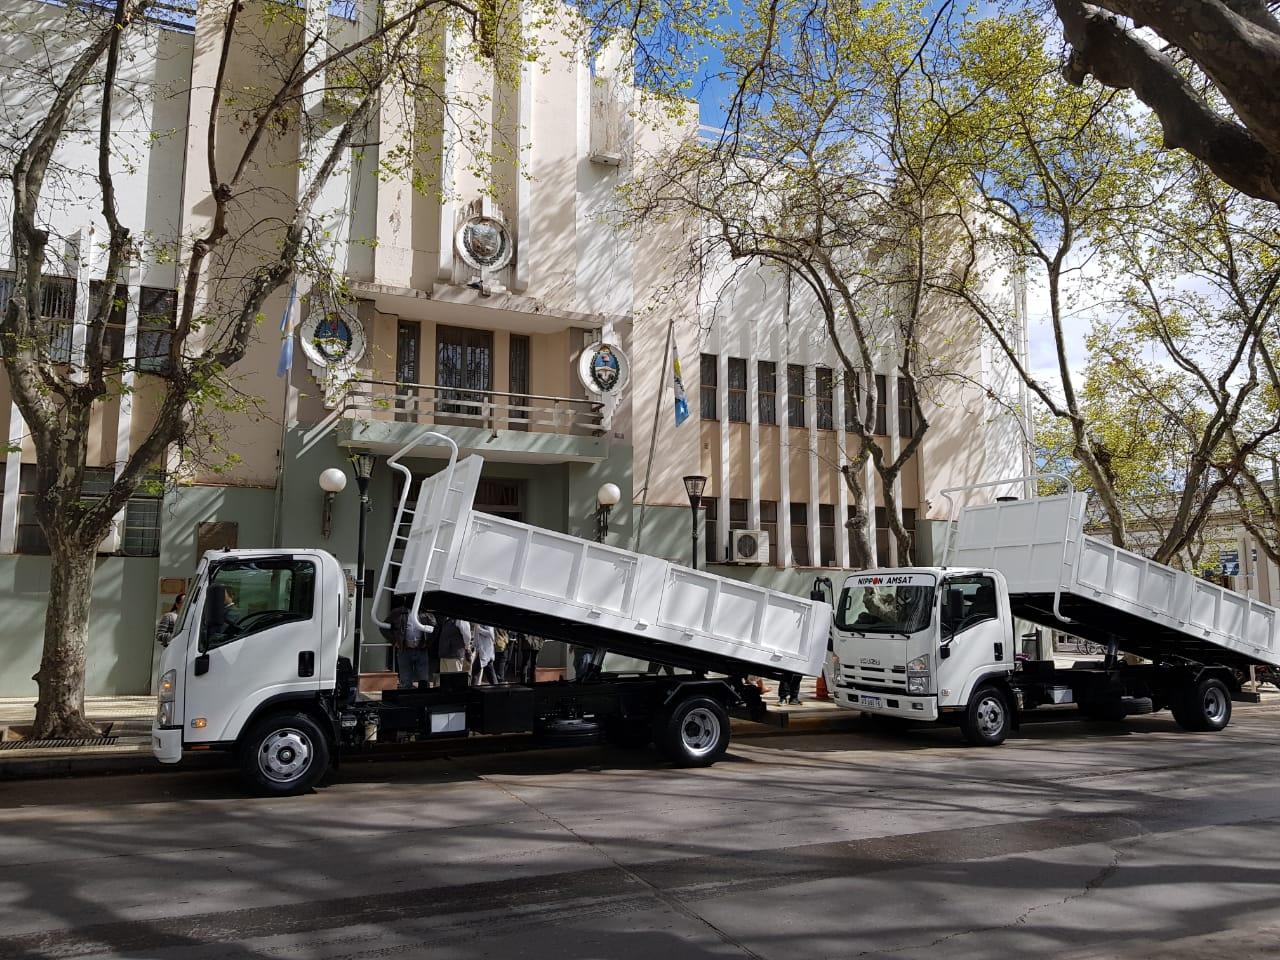 ISUZU entregó camiones a la Municipalidad de San Rafael